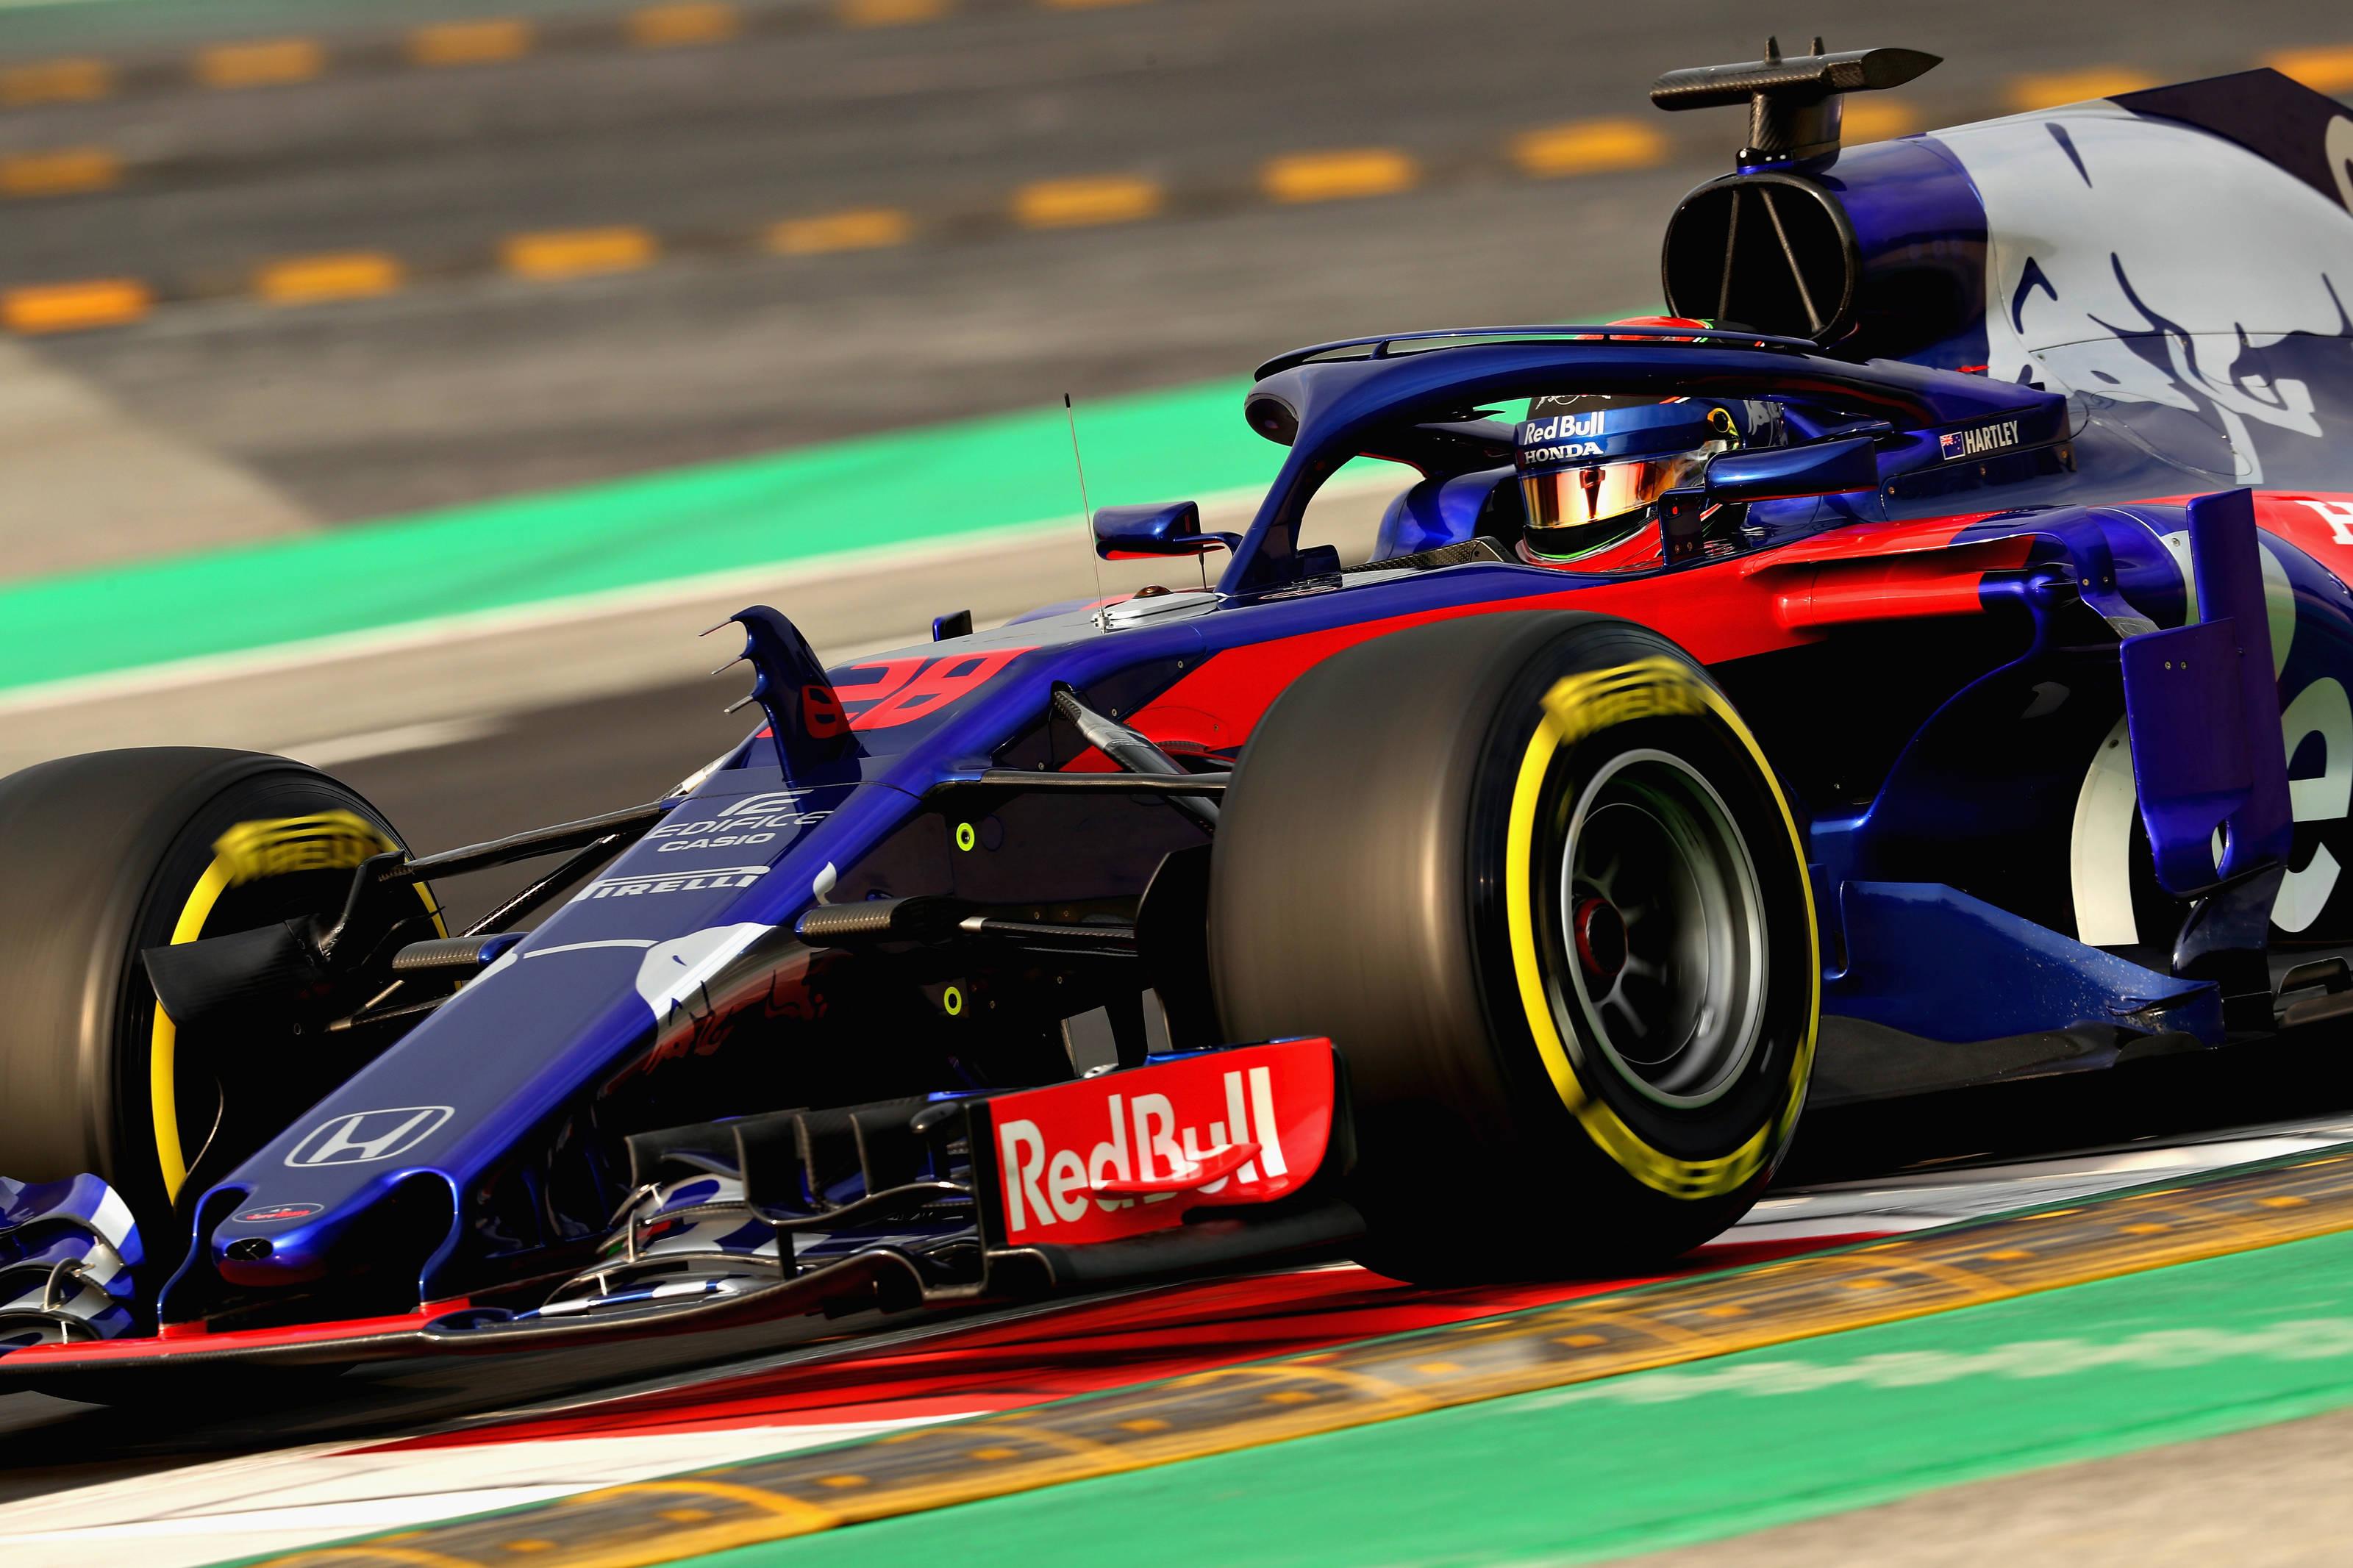 Ricciardo tops first 2018 test; Honda nears 100 laps – ThePitcrewOnline